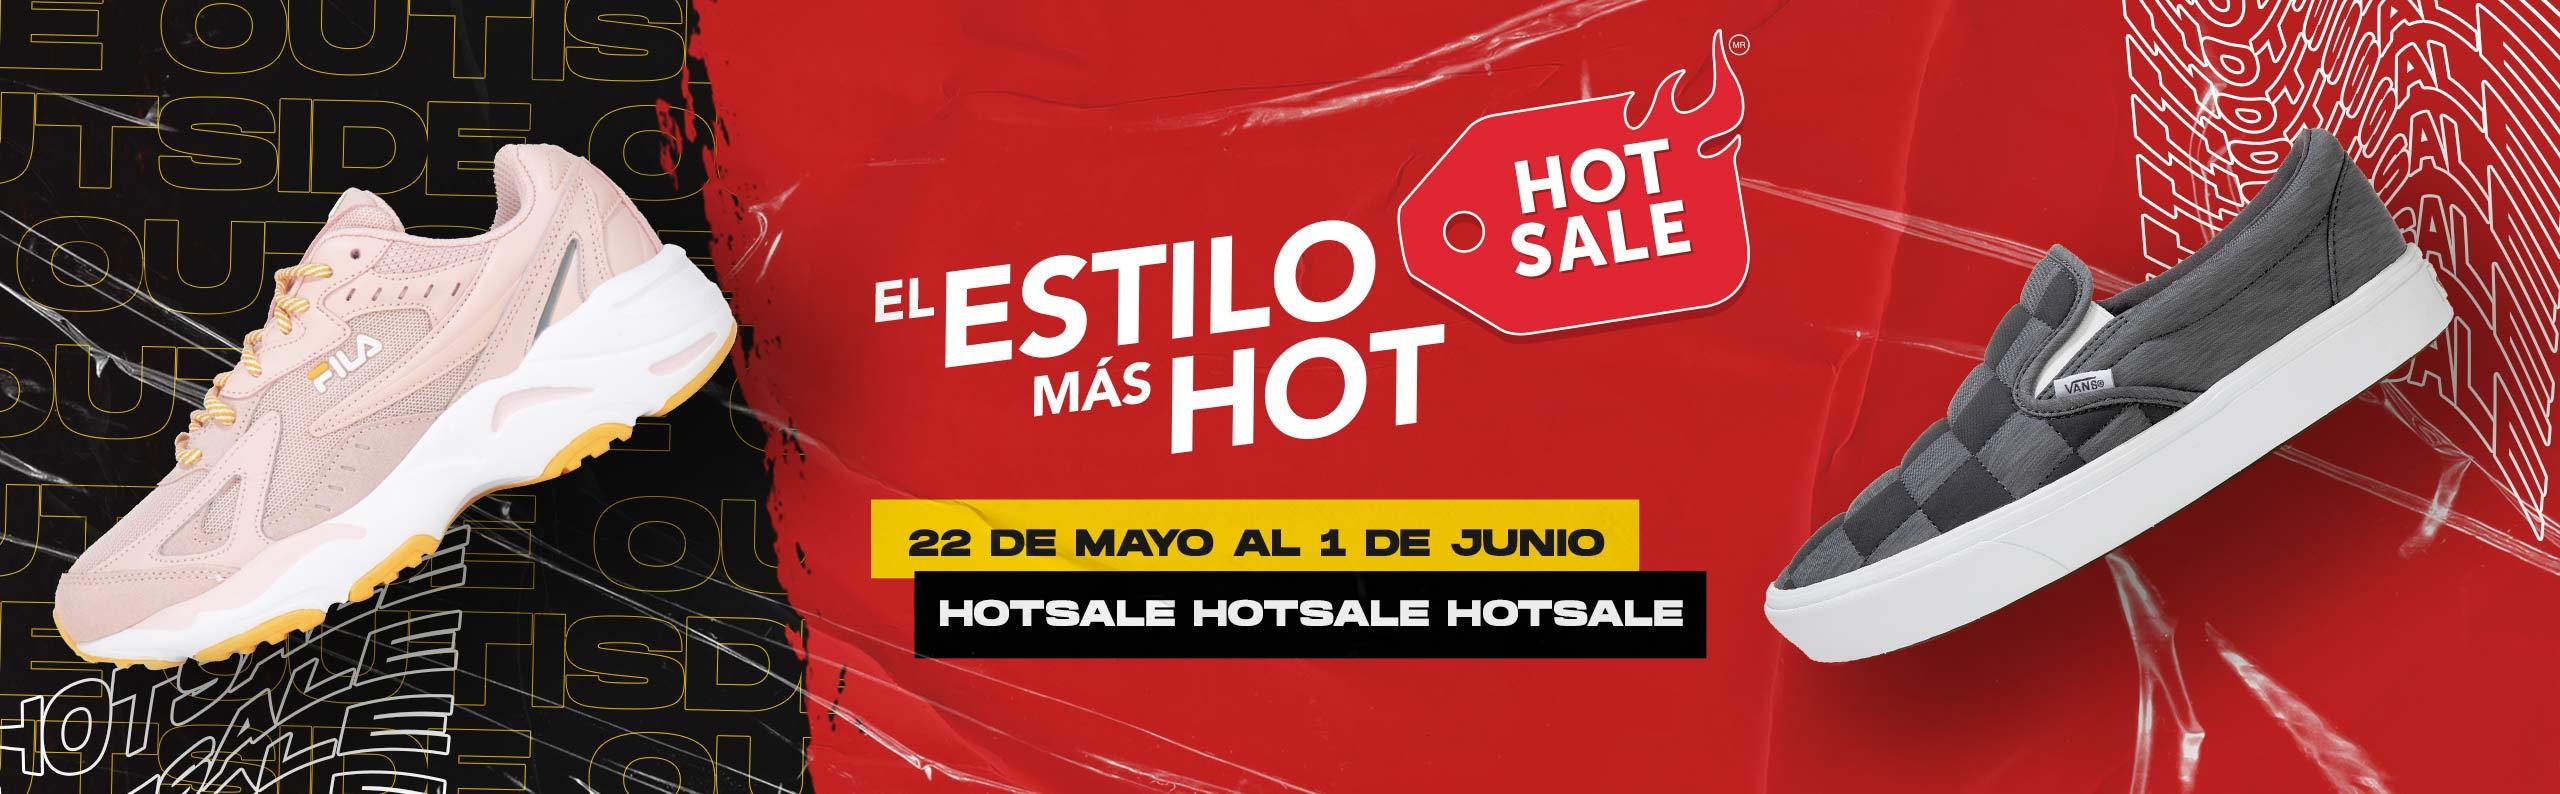 Hot Sale Ofertas Ropa de Moda dpstreet